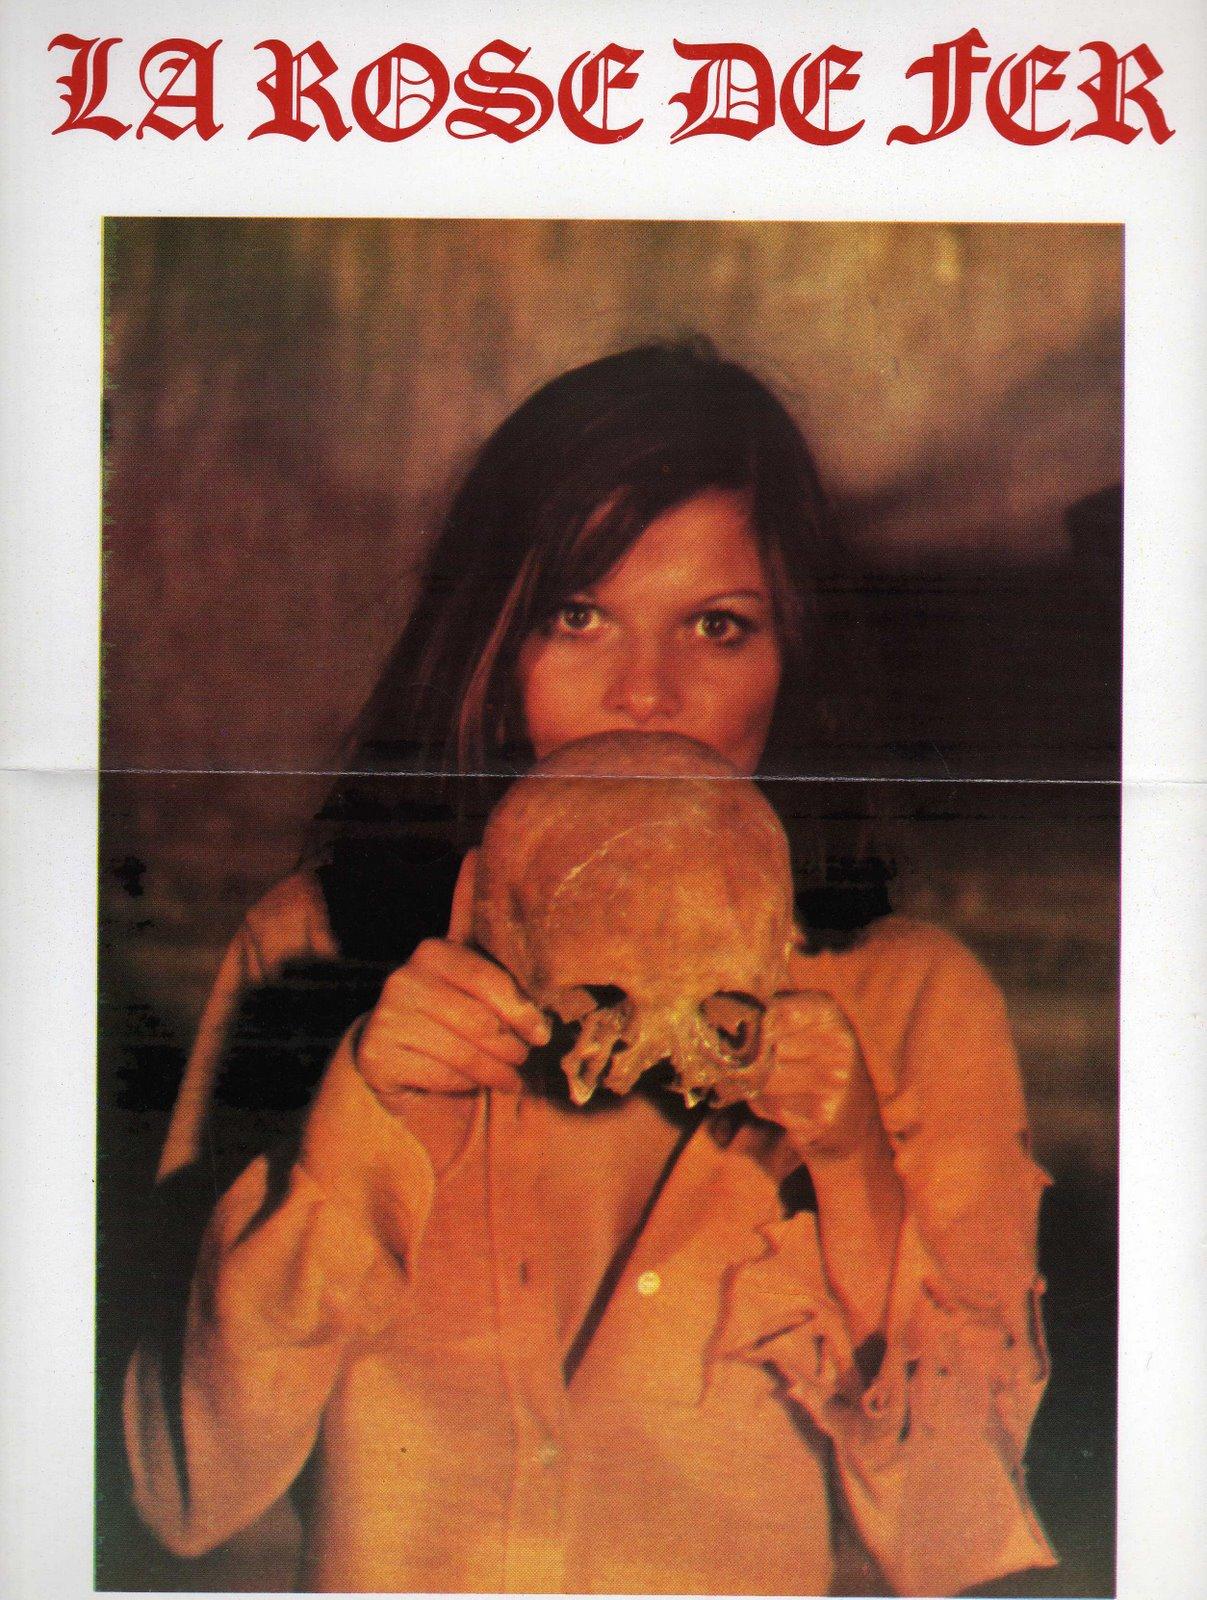 La rose de fer (1977) de JEAN ROLLIN